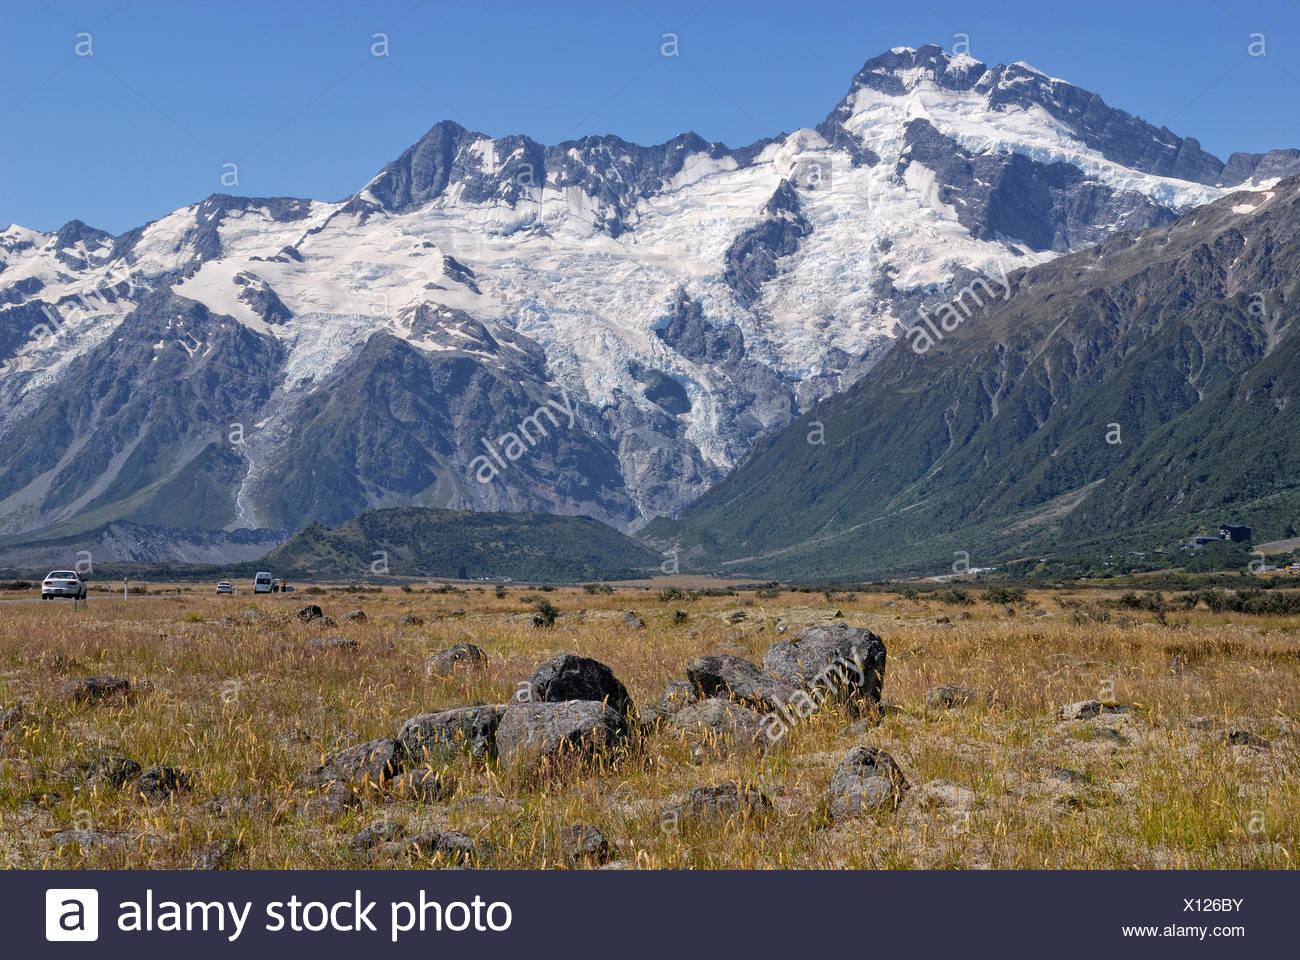 Huddestone Glacier, Stocking Glacier and Mueller Glacier, Mount Cook National Park, South Island, New Zealand - Stock Image